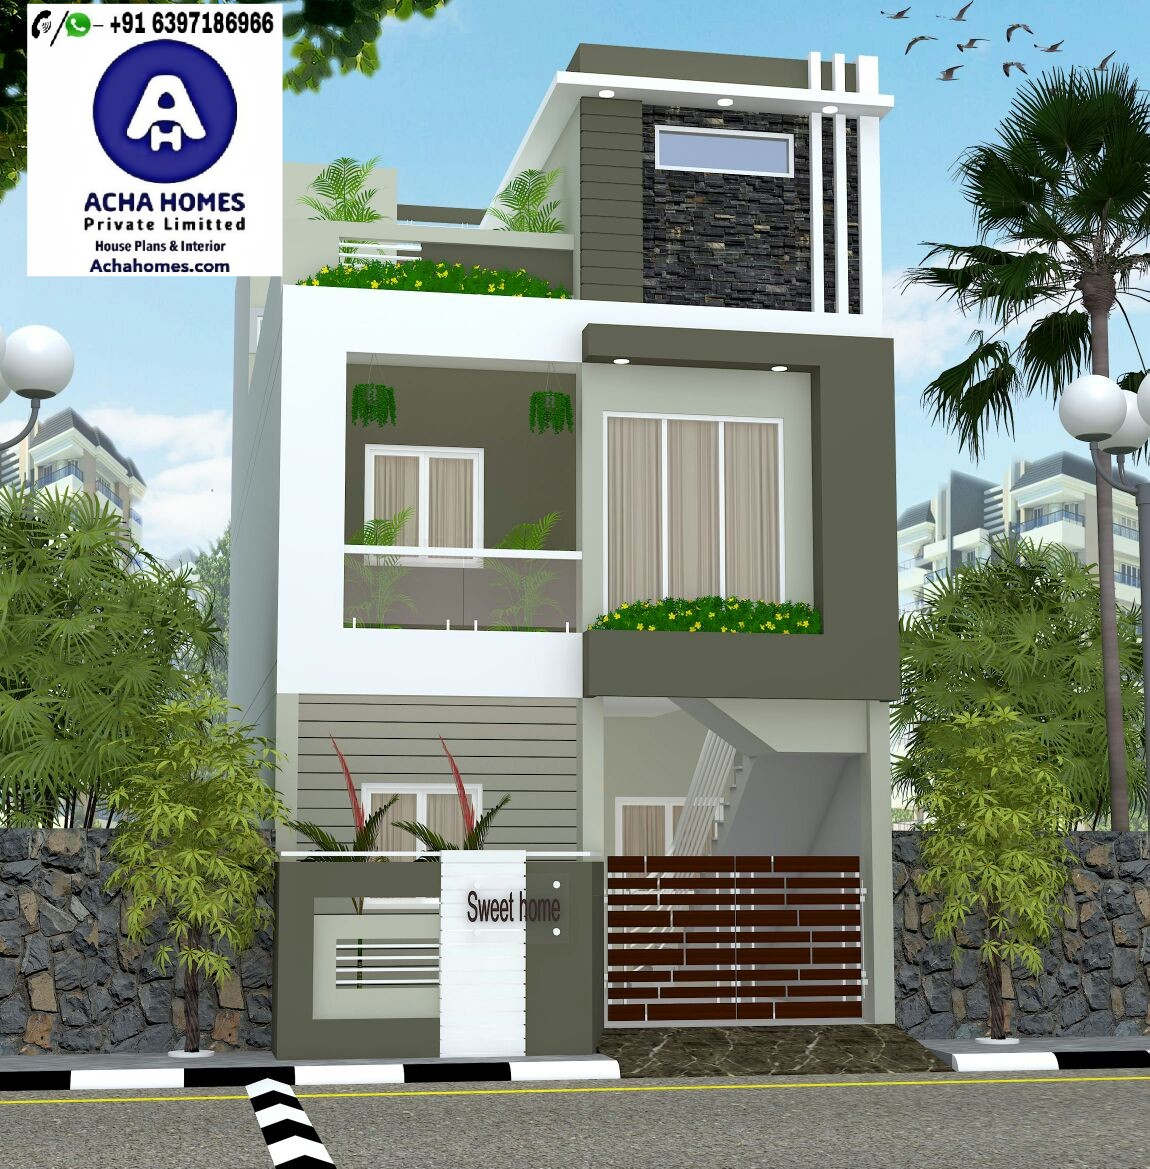 3 Bedroom Modern Home Design Tips Ideas India Stunning House Plan